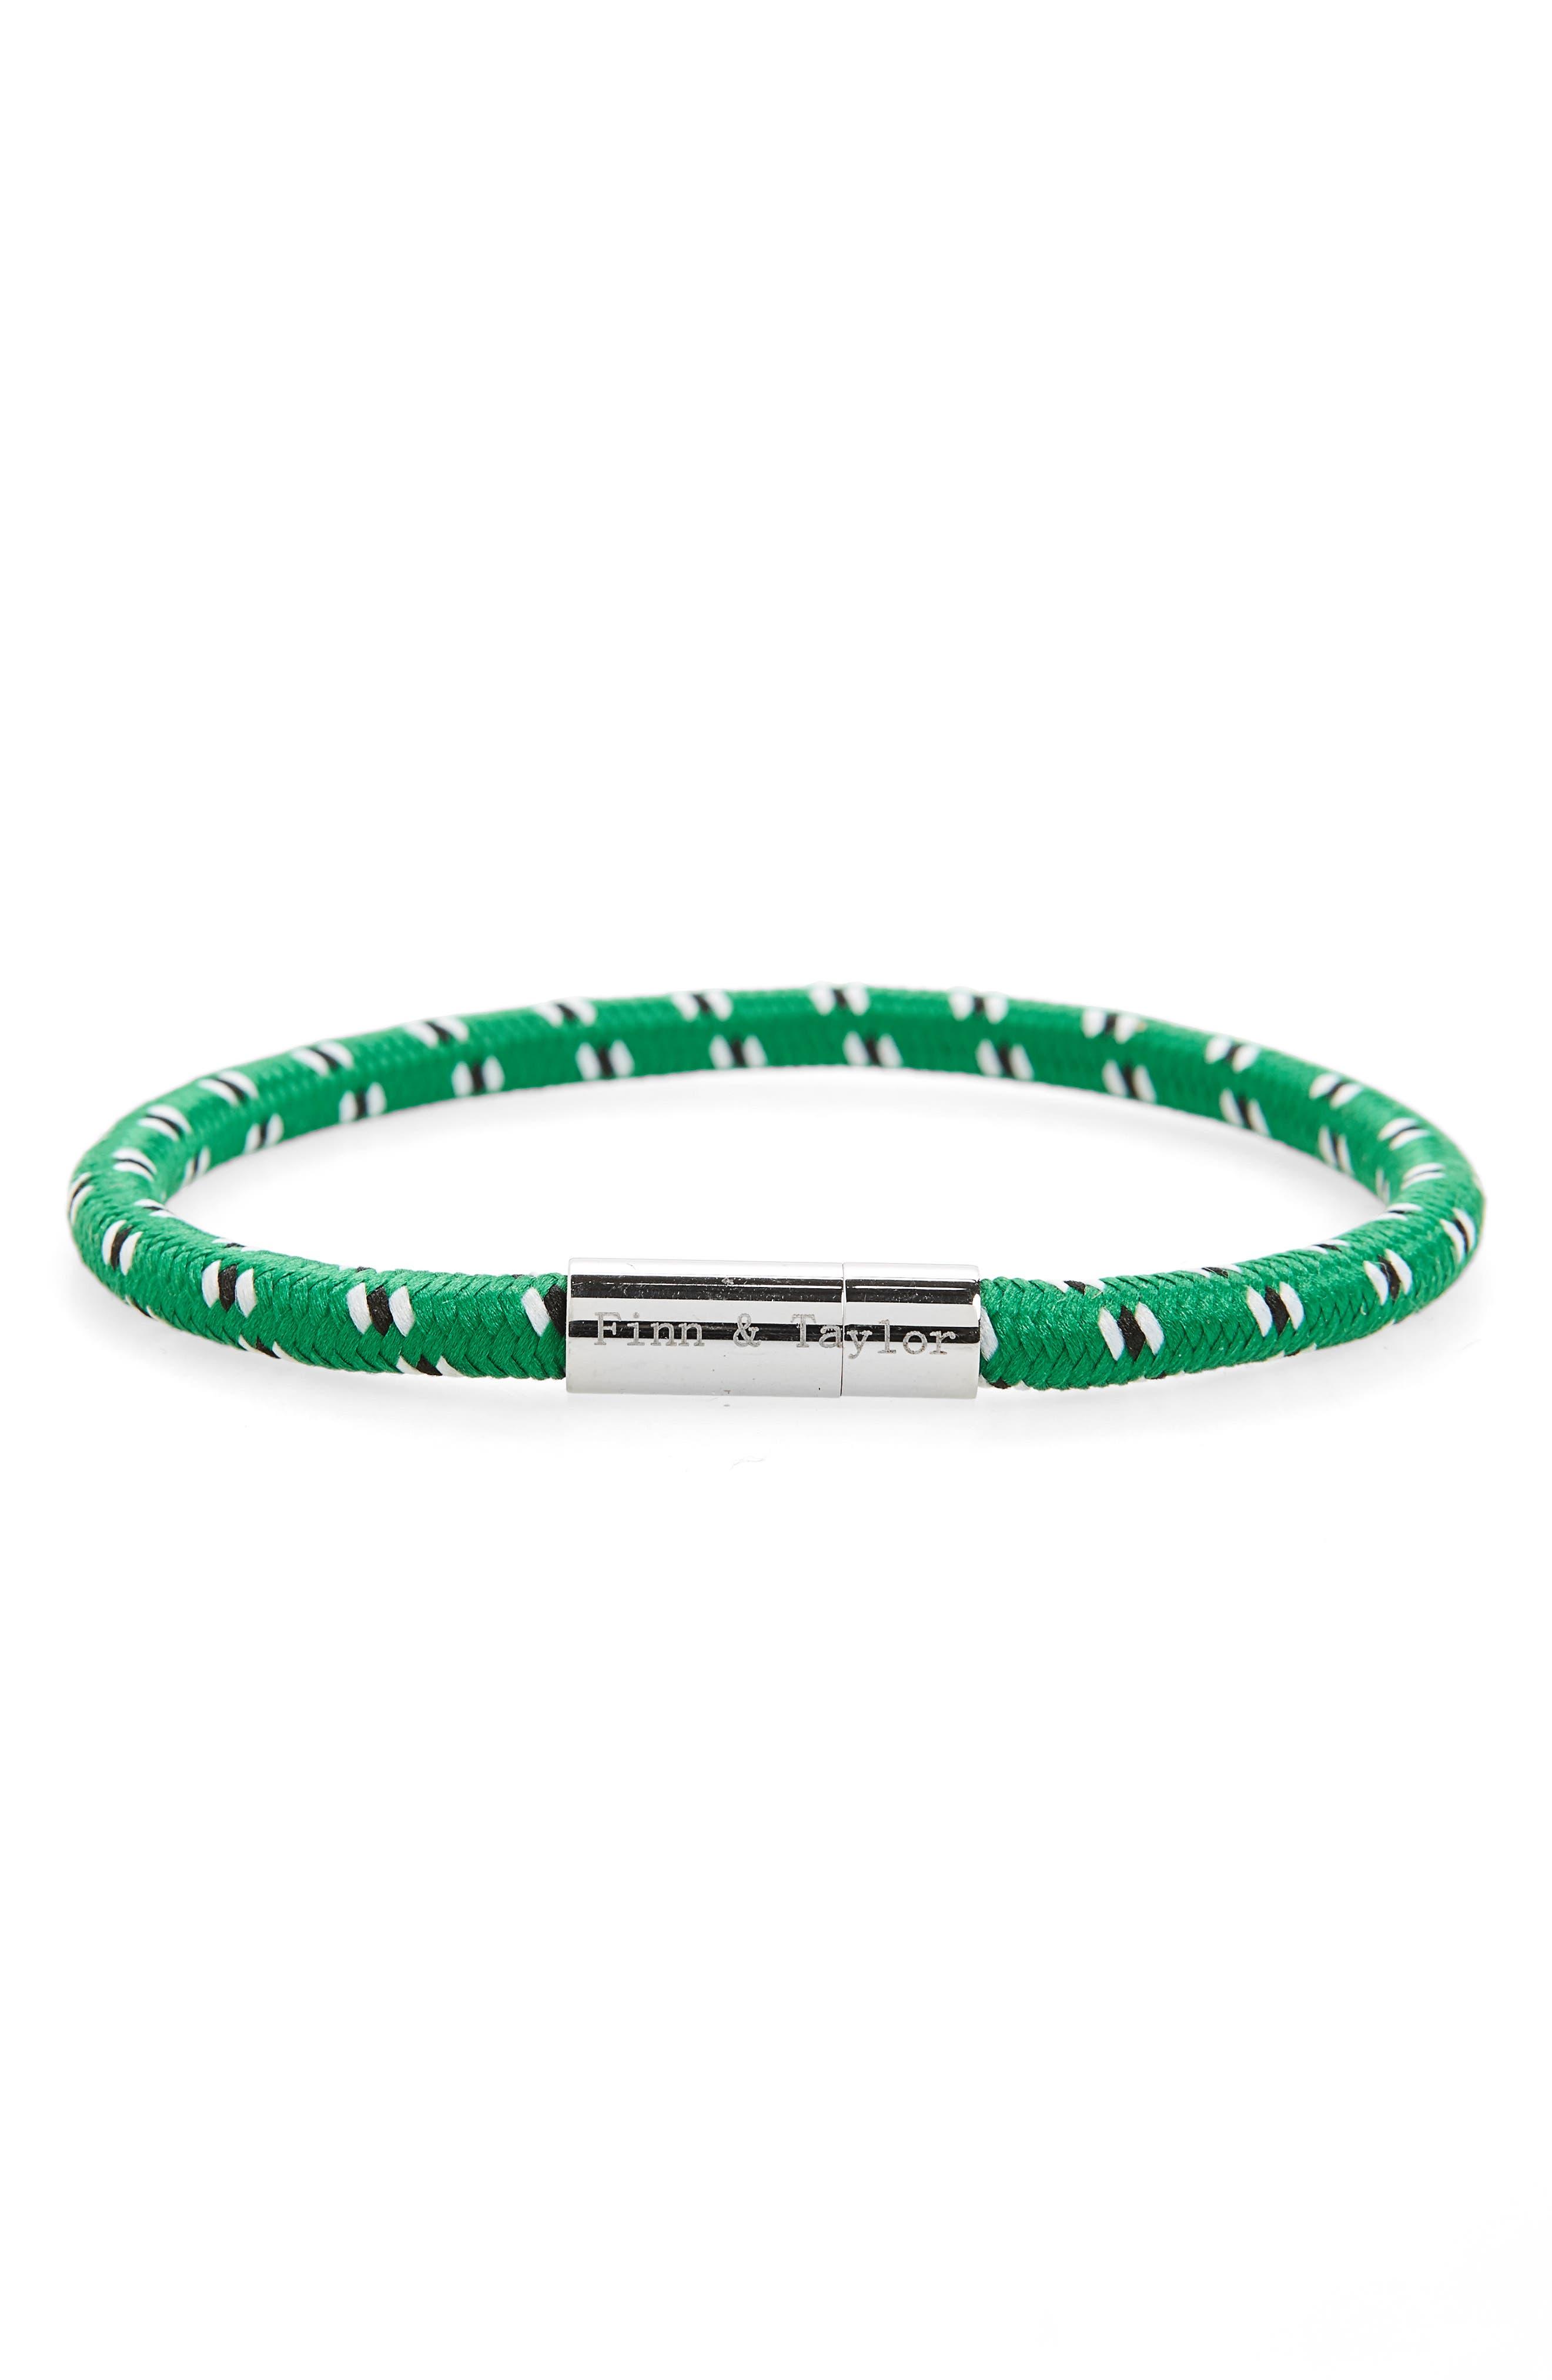 Main Image - Finn & Taylor Elastic Bracelet